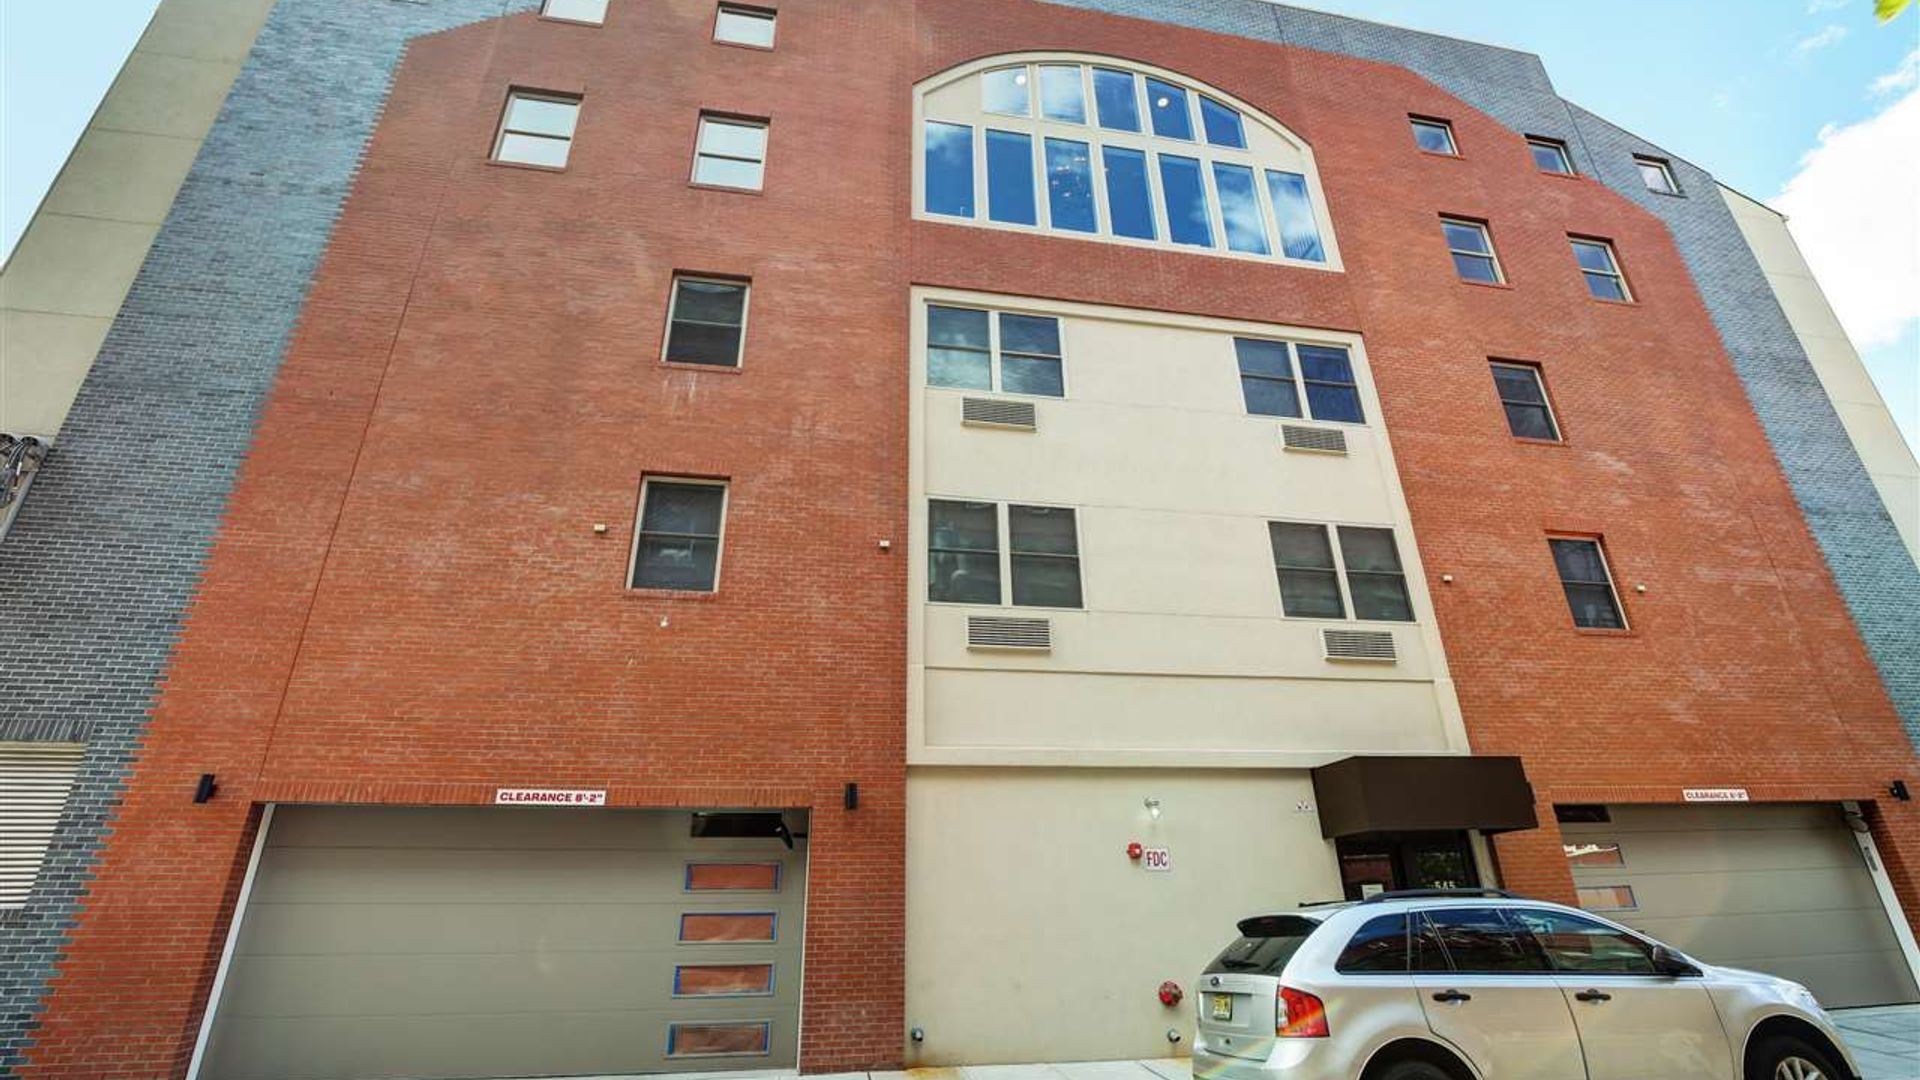 Apartment at 545 39th Street, Union City, NJ 07087, USA ...